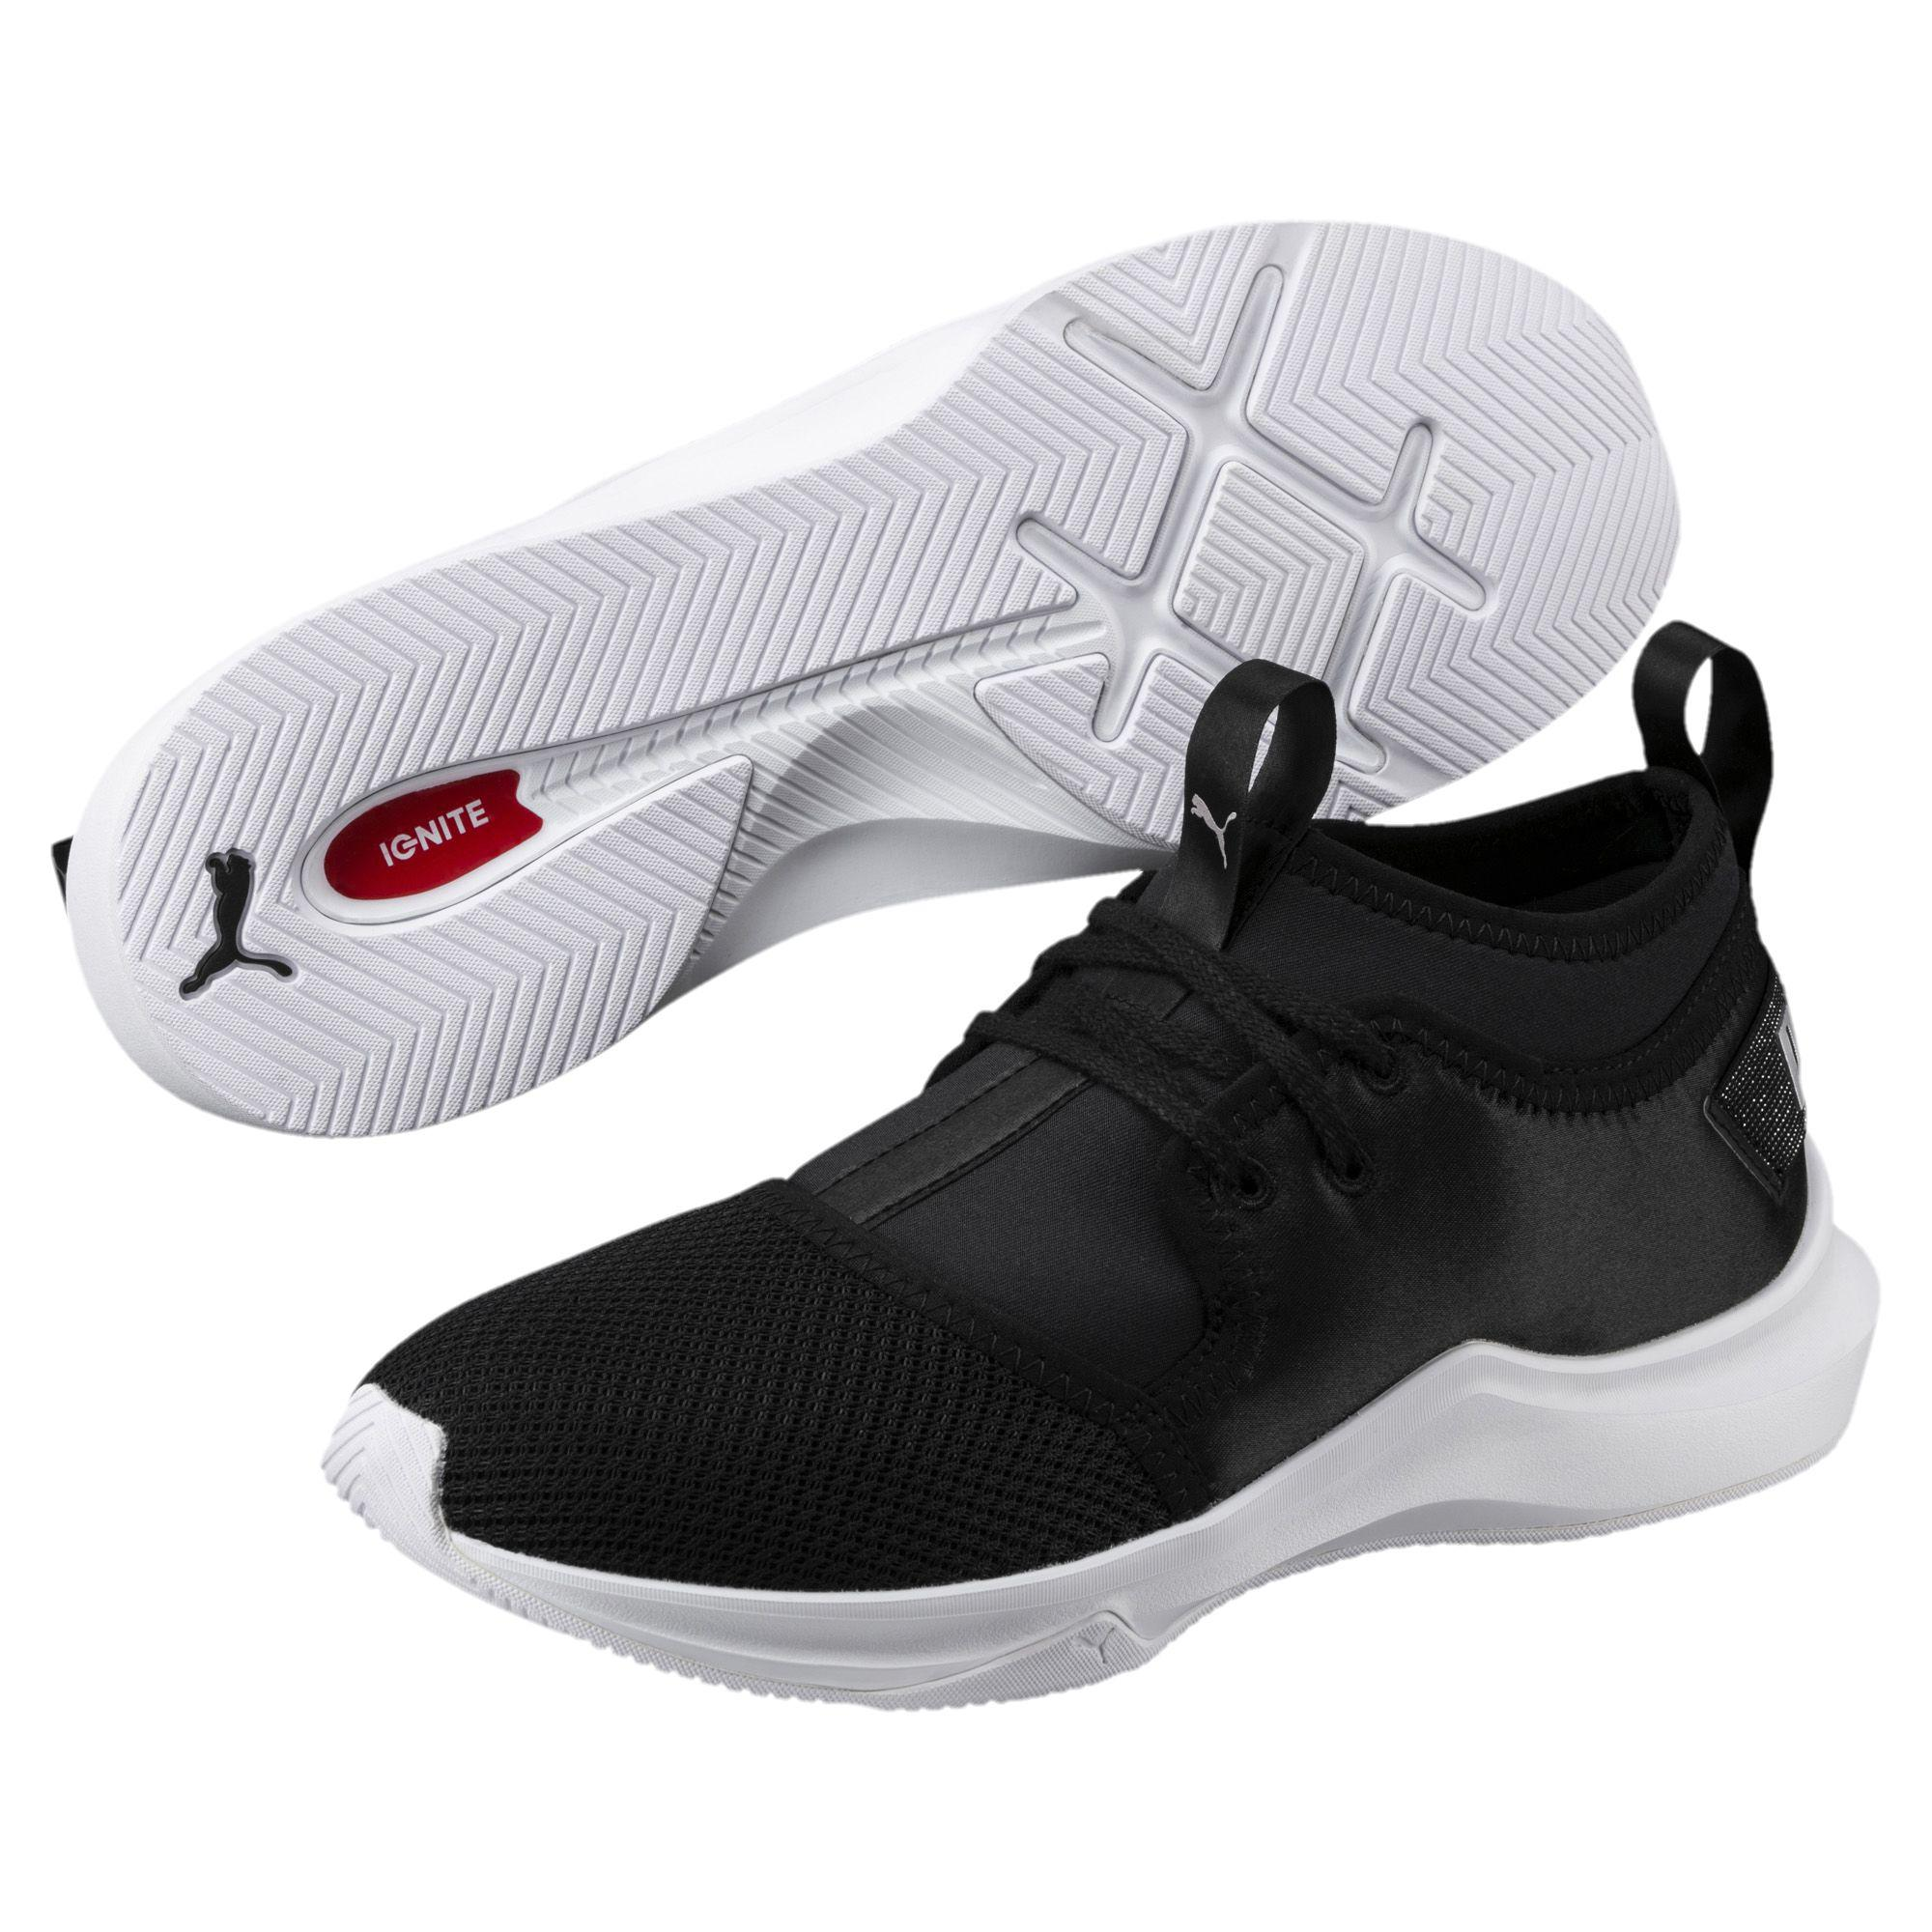 203983778ee0 Lyst - PUMA Phenom Satin Low Ep Women s Training Shoes in Black